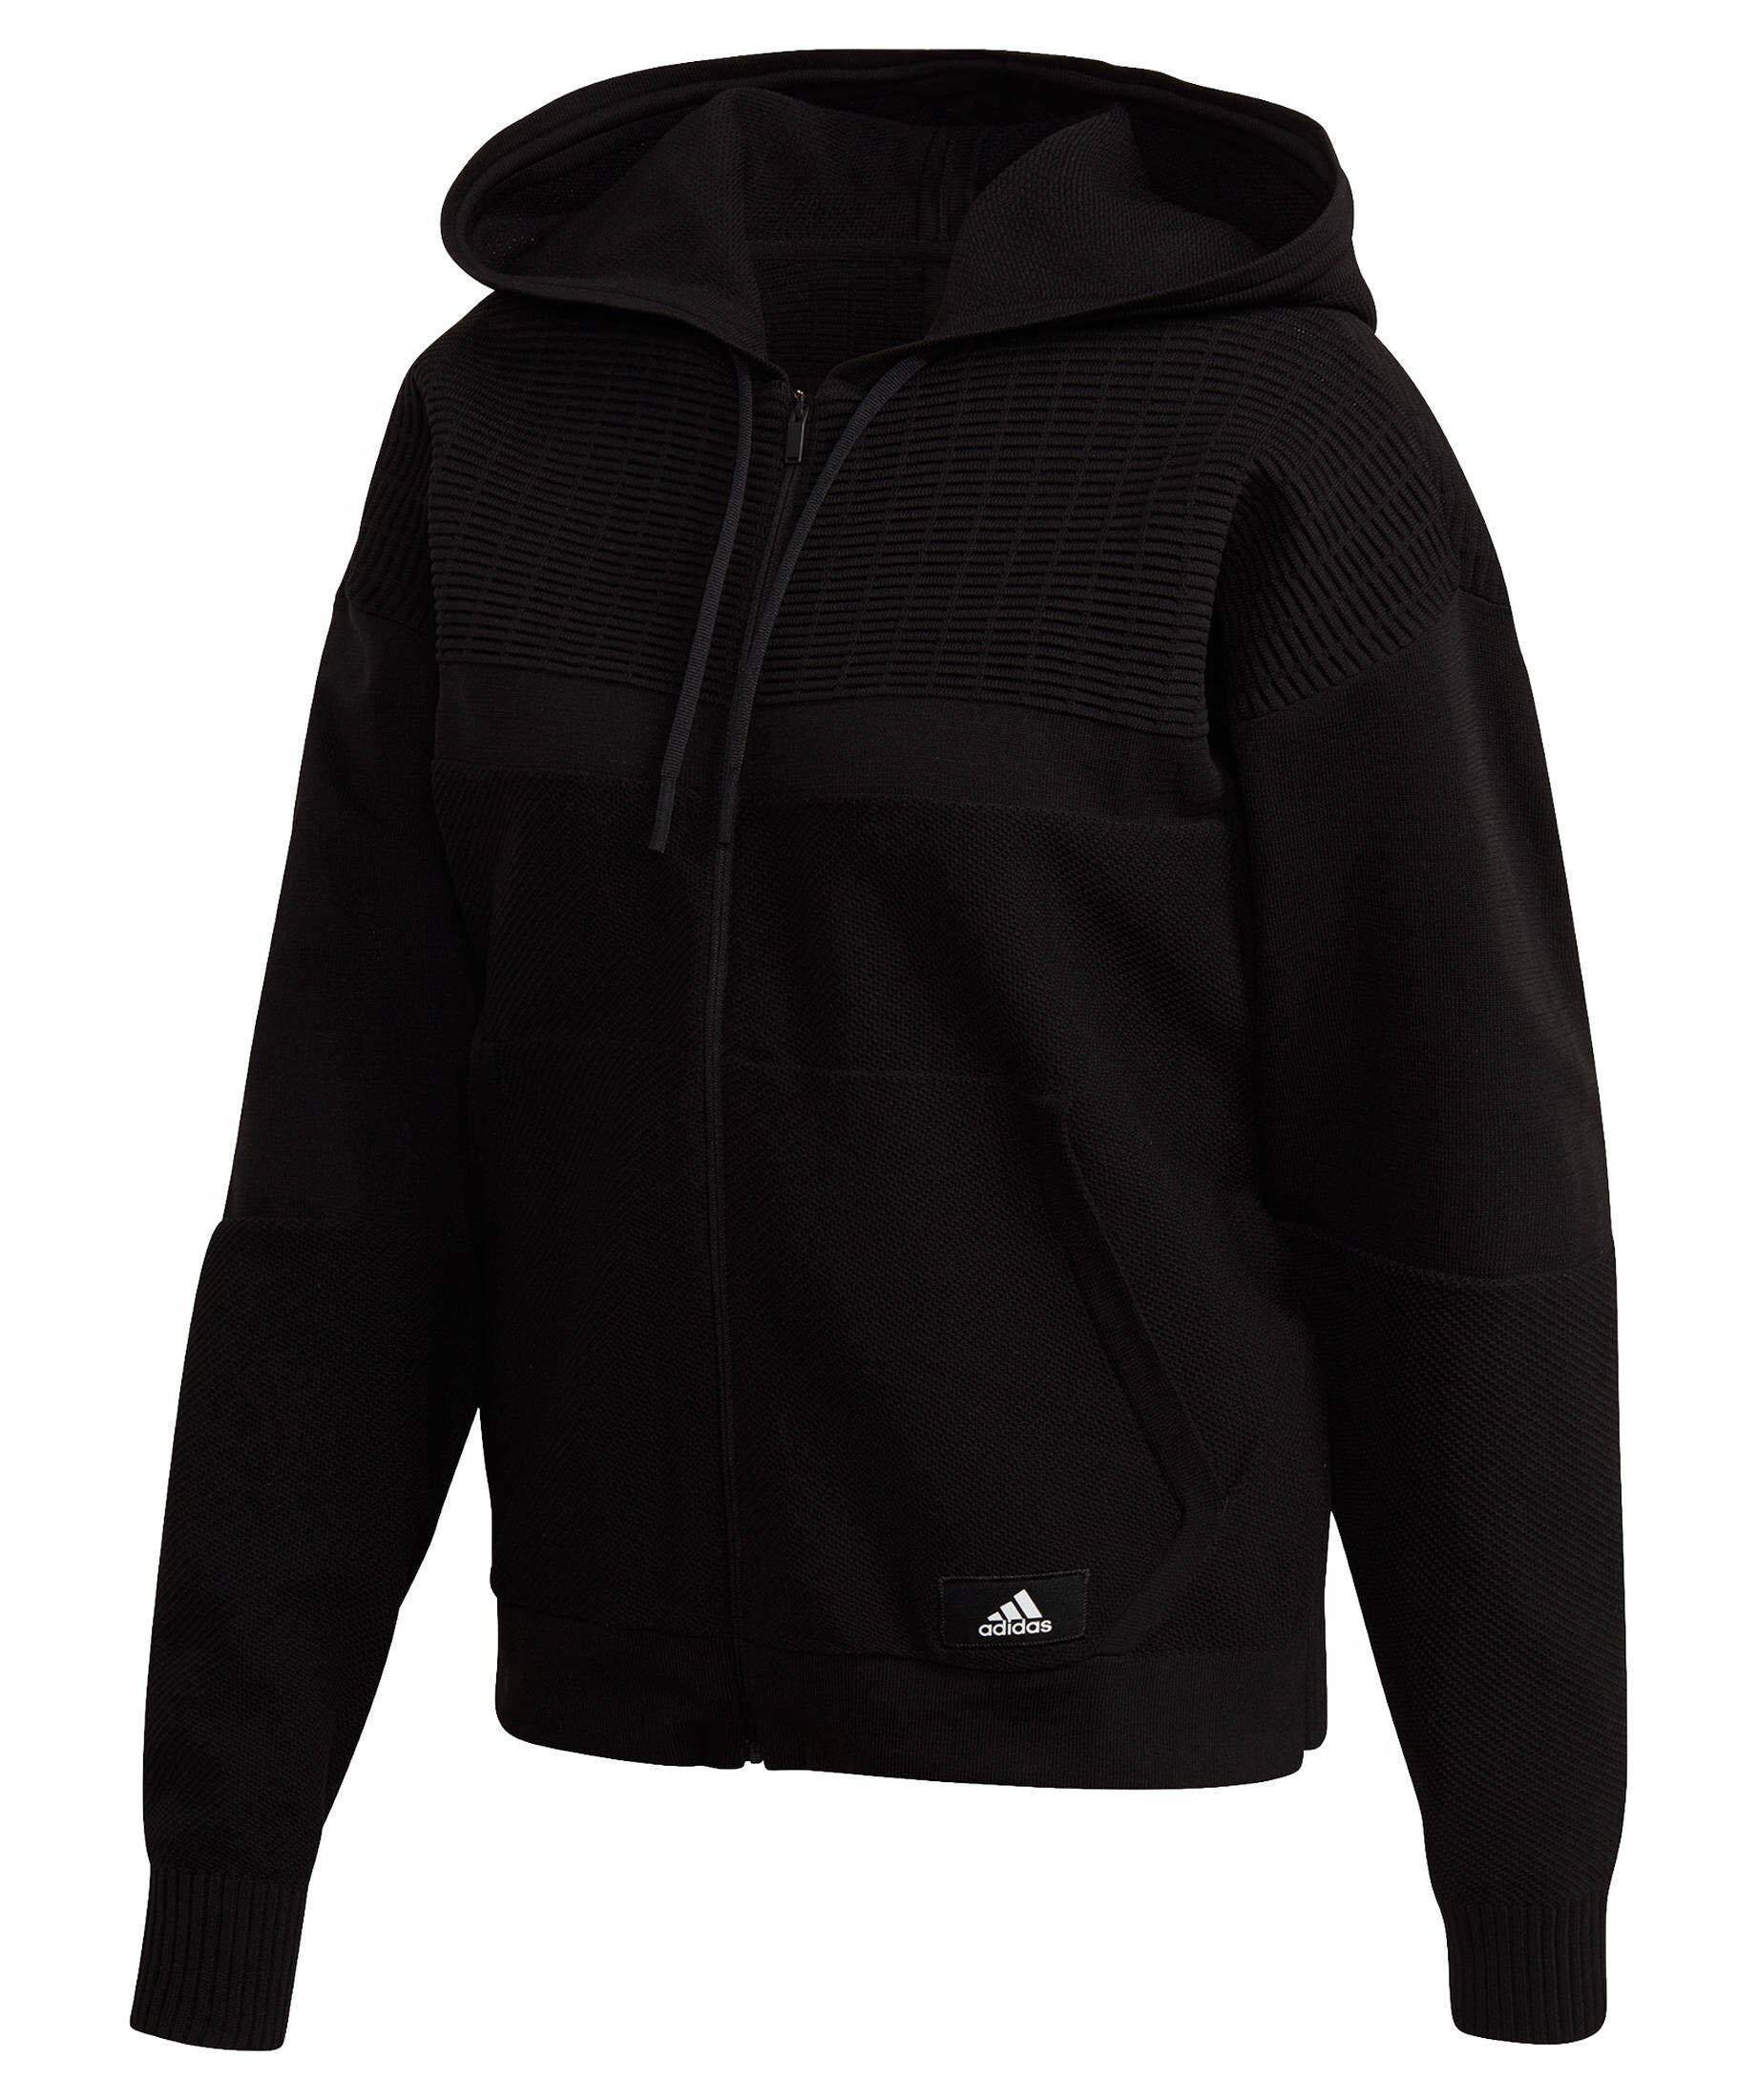 adidas Damen W Knit V Hoodie Sweatshirt, Black, S